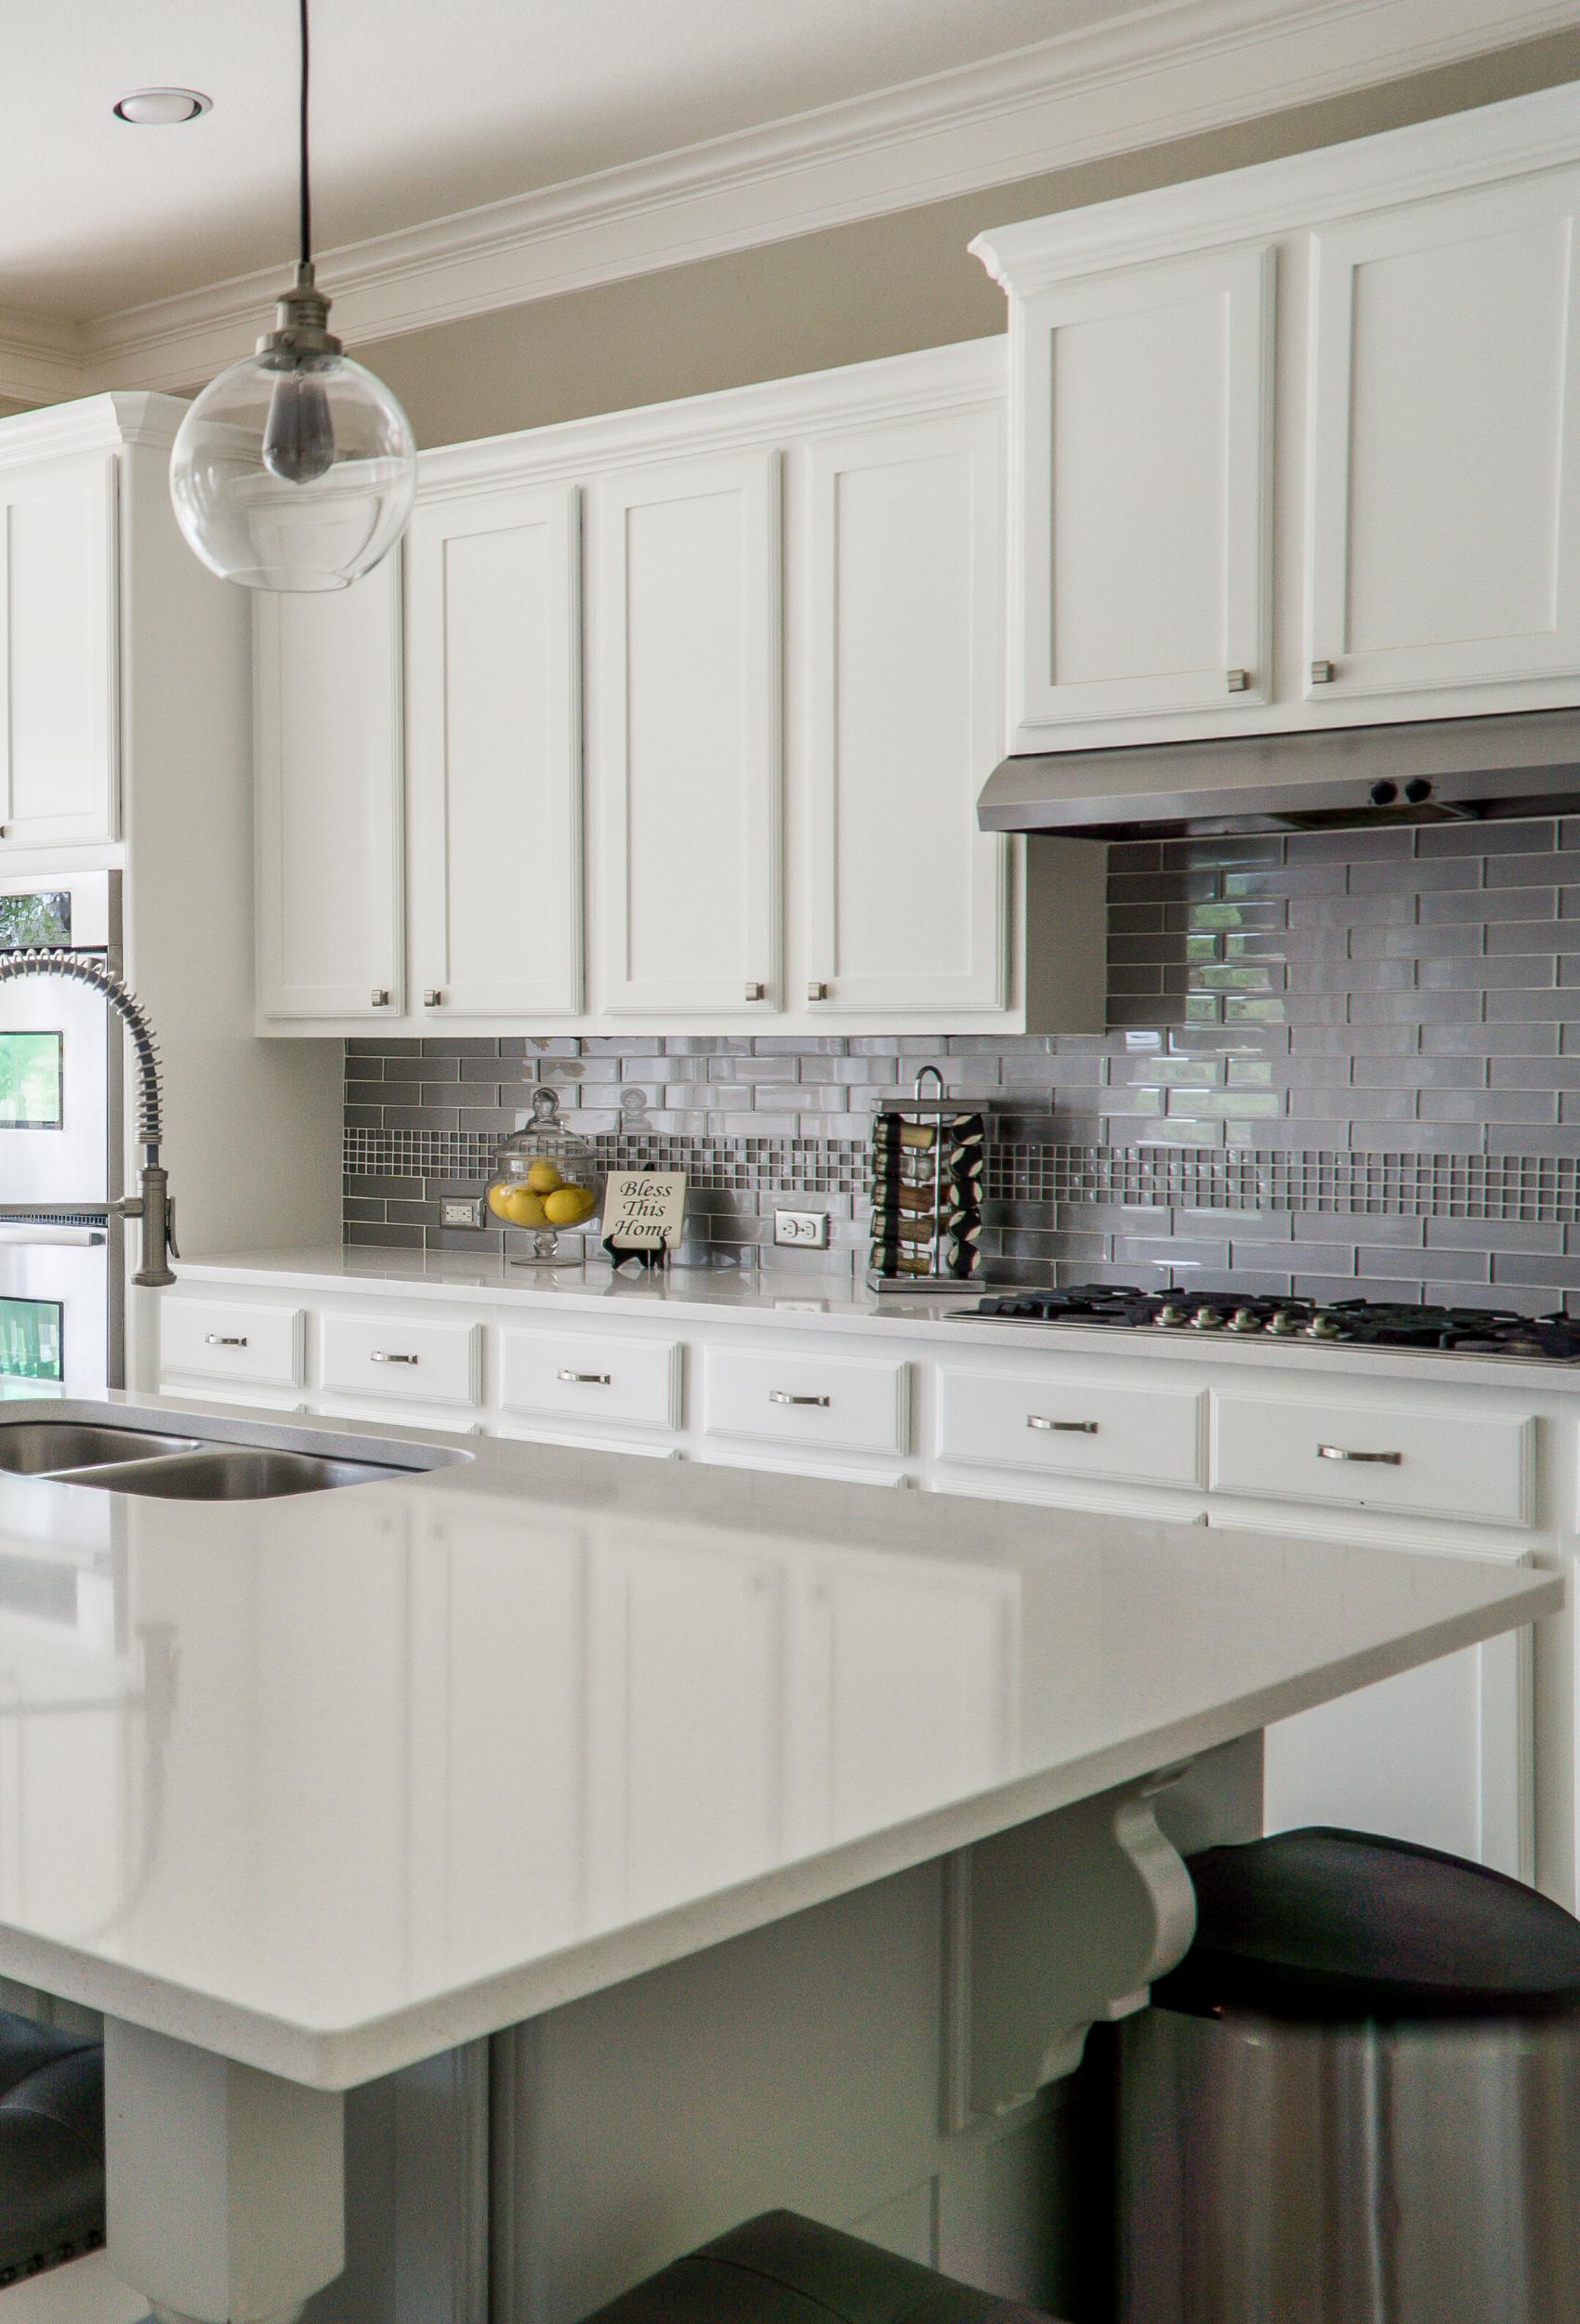 r a williams brisbane builders kitchen renovation